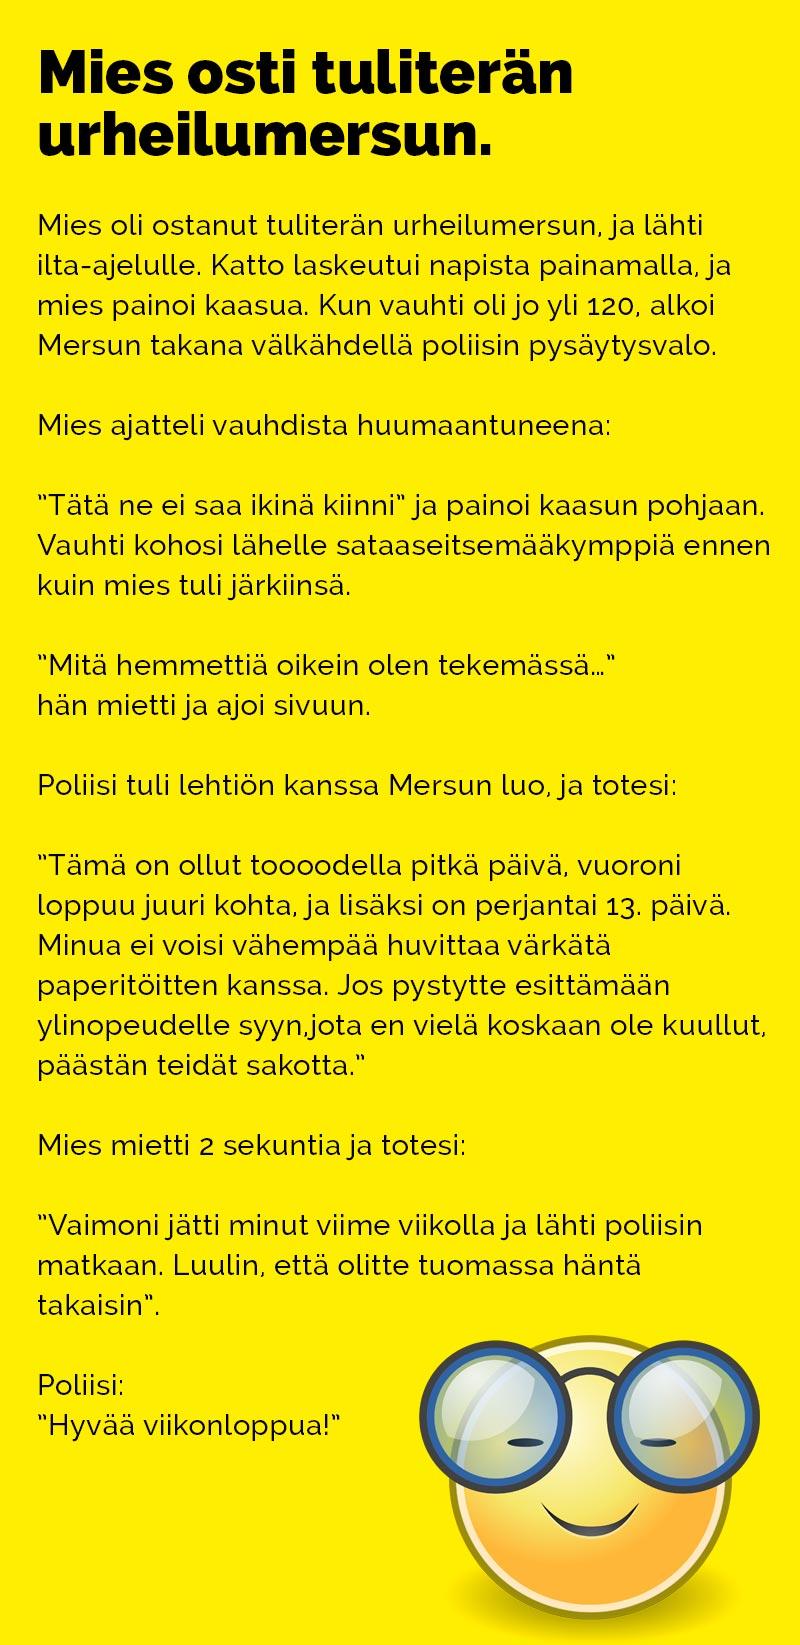 vitsit_mies_osti_tuliteran_urheilumersu_2